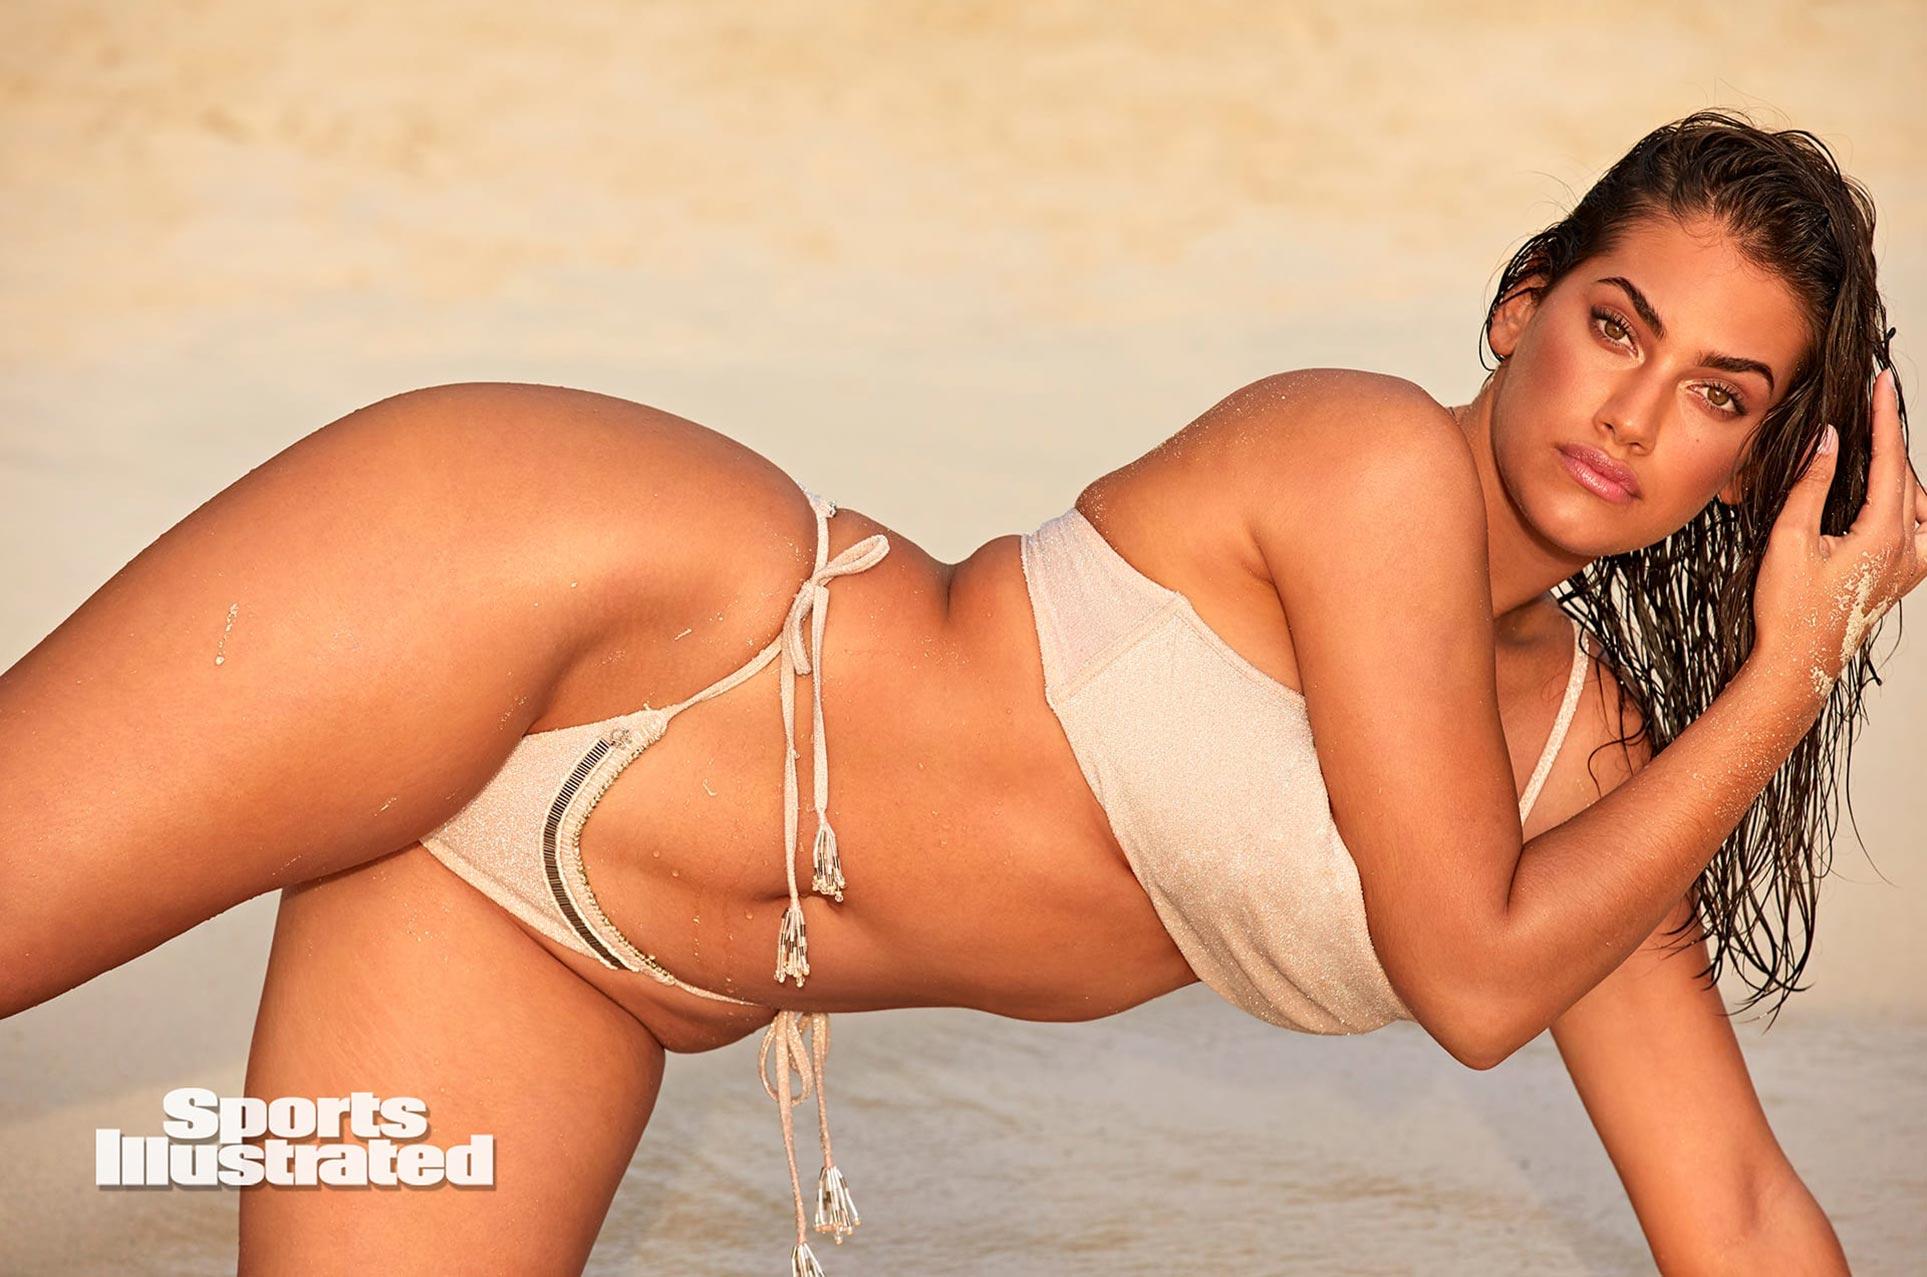 Лорена Дюран в каталоге купальников Sports Illustrated Swimsuit 2020 / фото 03